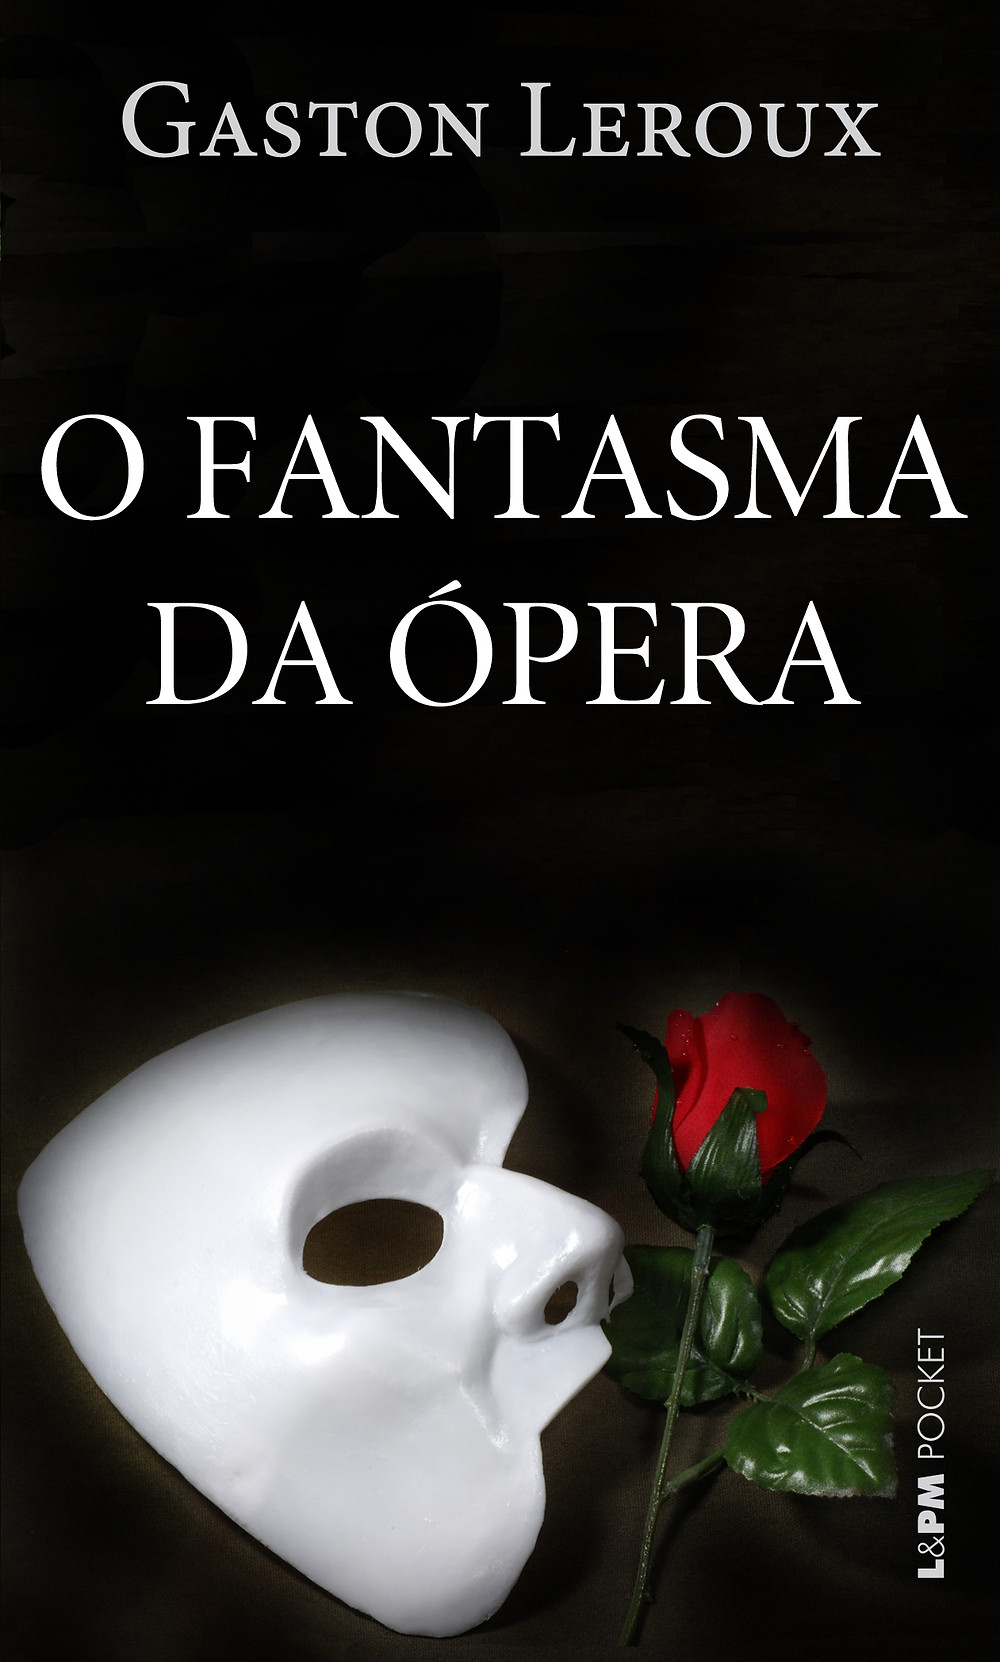 O Fantasma da Ópera, Gaston Leroux